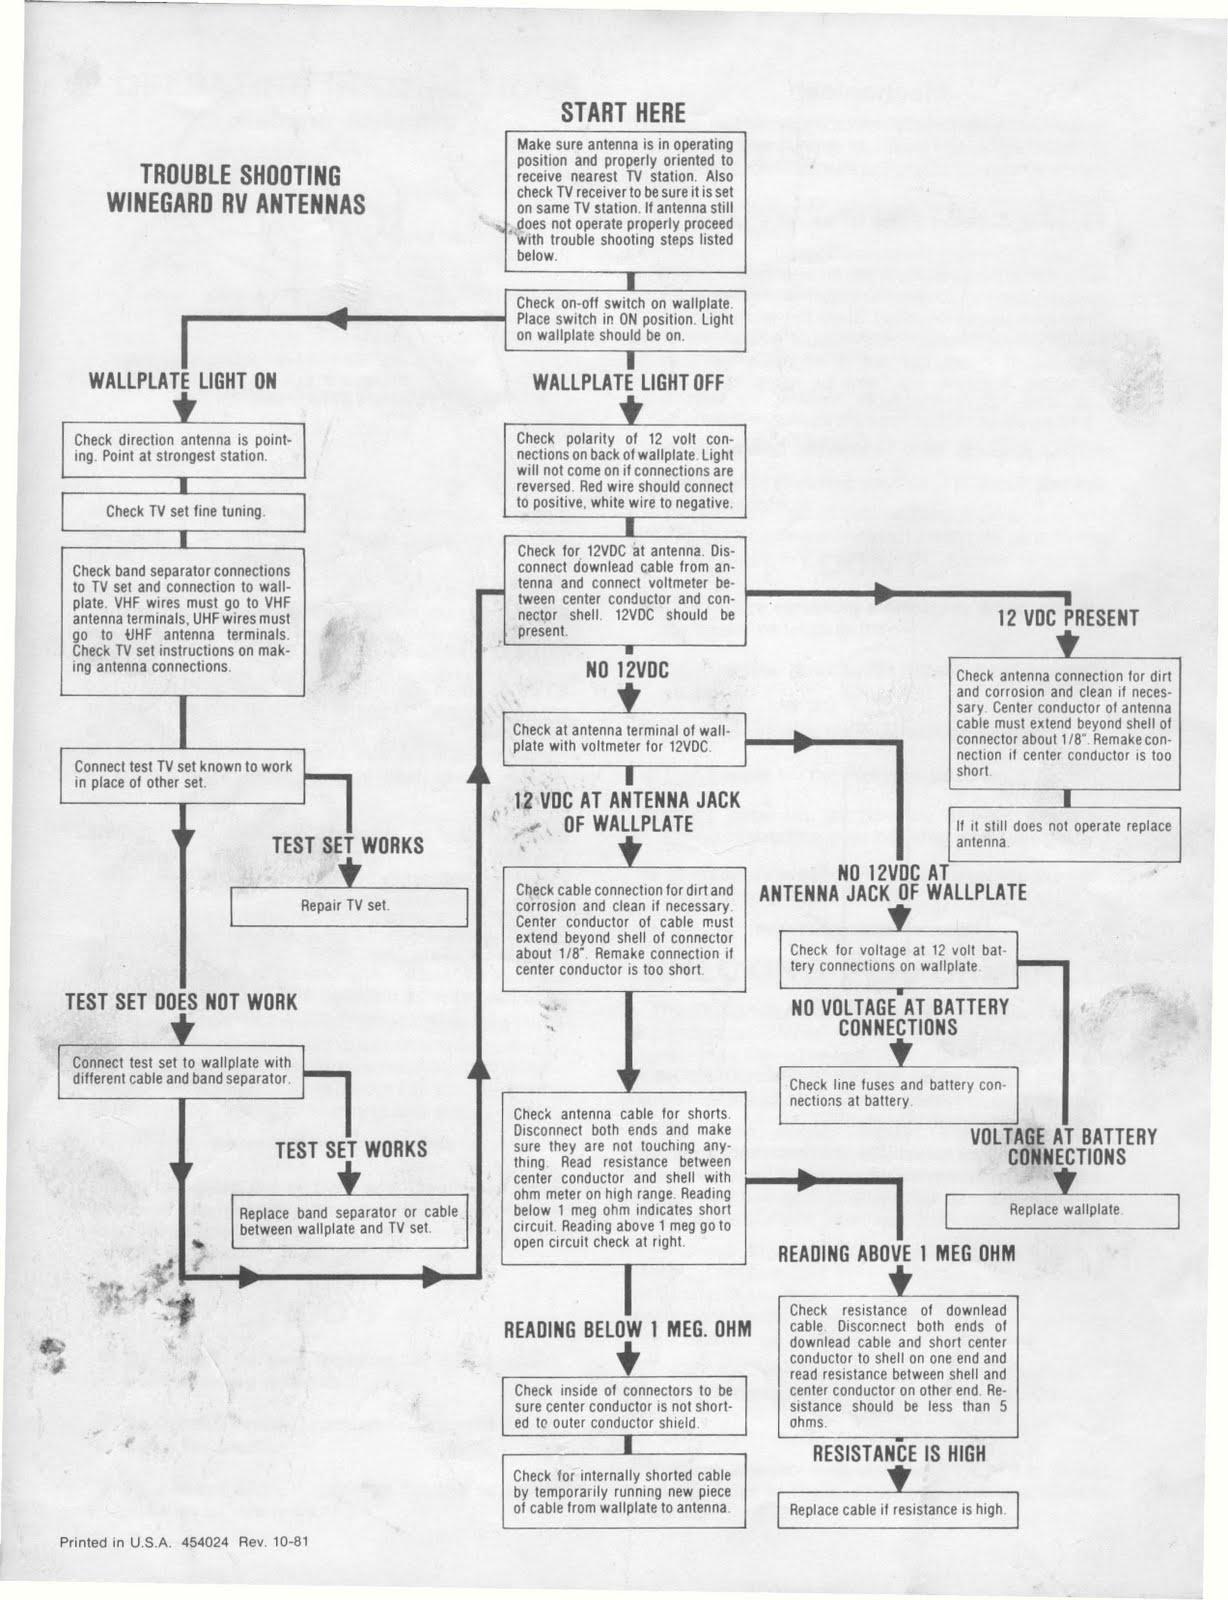 1983 Fleetwood Pace Arrow Owners Manuals: Winegard RV tv